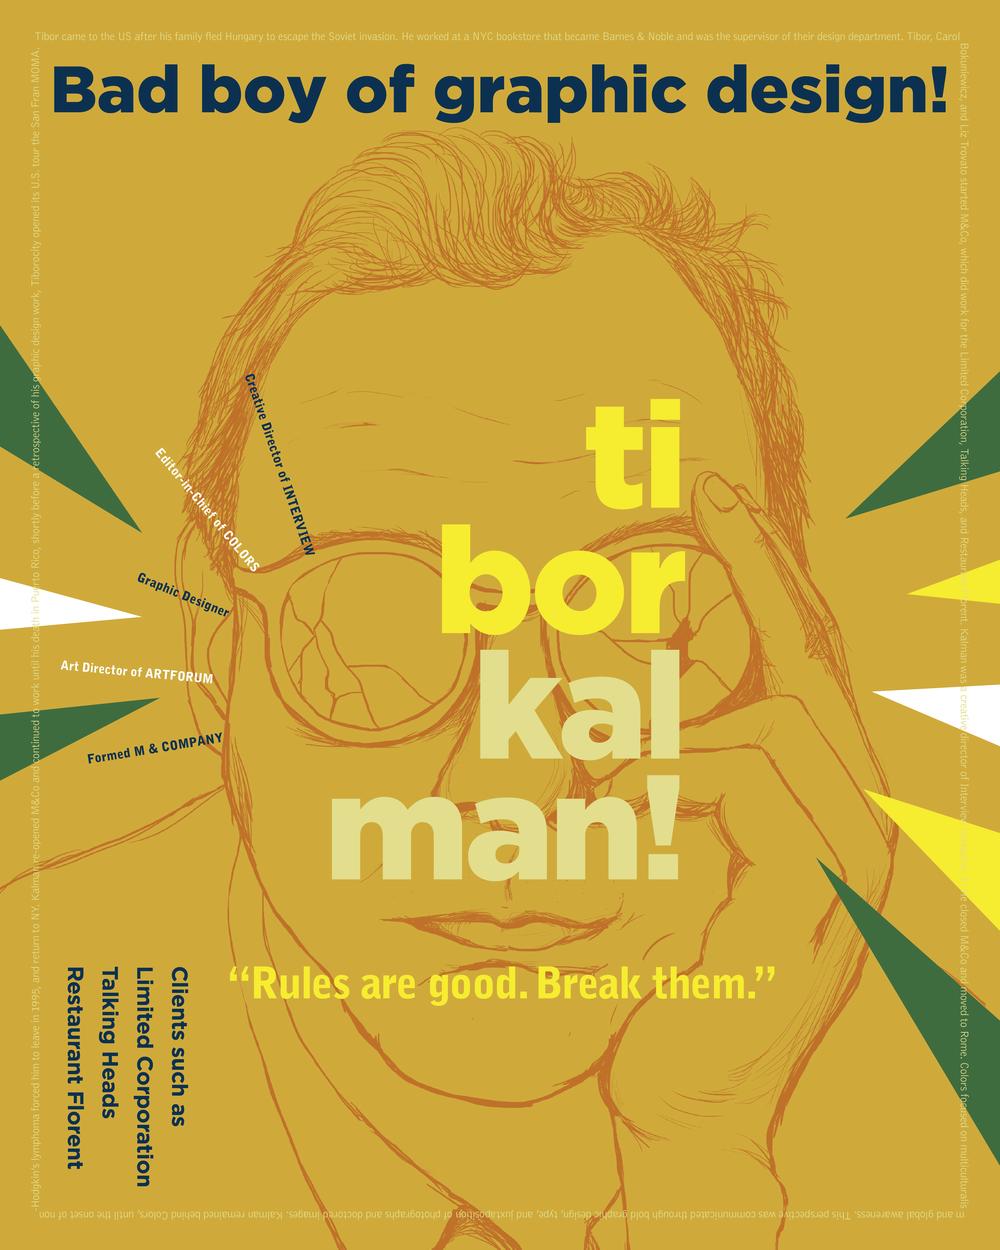 Tibor Kalman Designer Poster 02.14.174.png